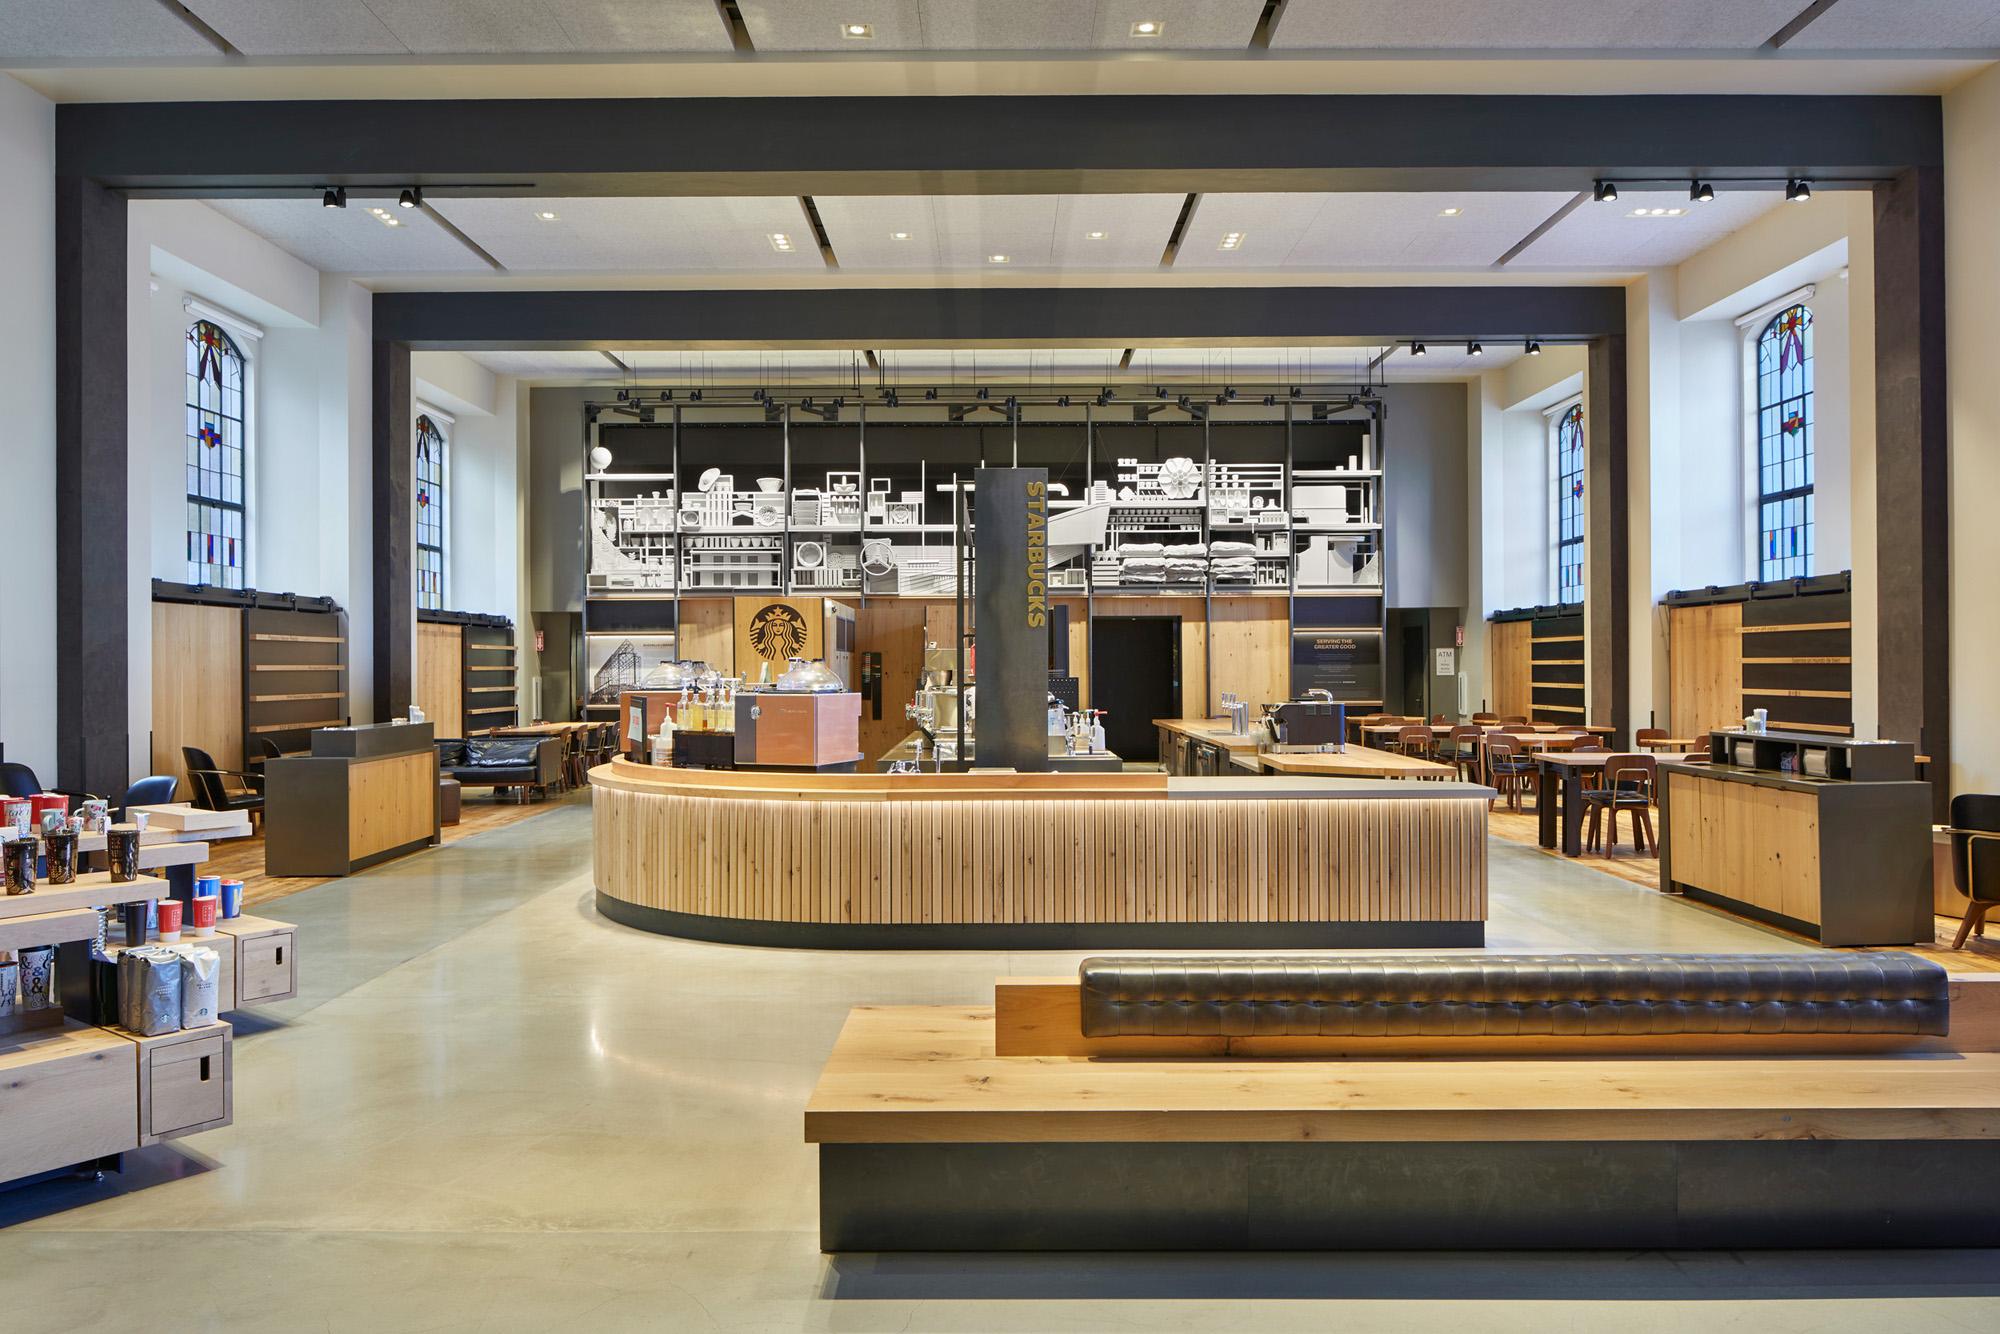 UW Suzzallo Library Starbucks_BB_002_web.jpg